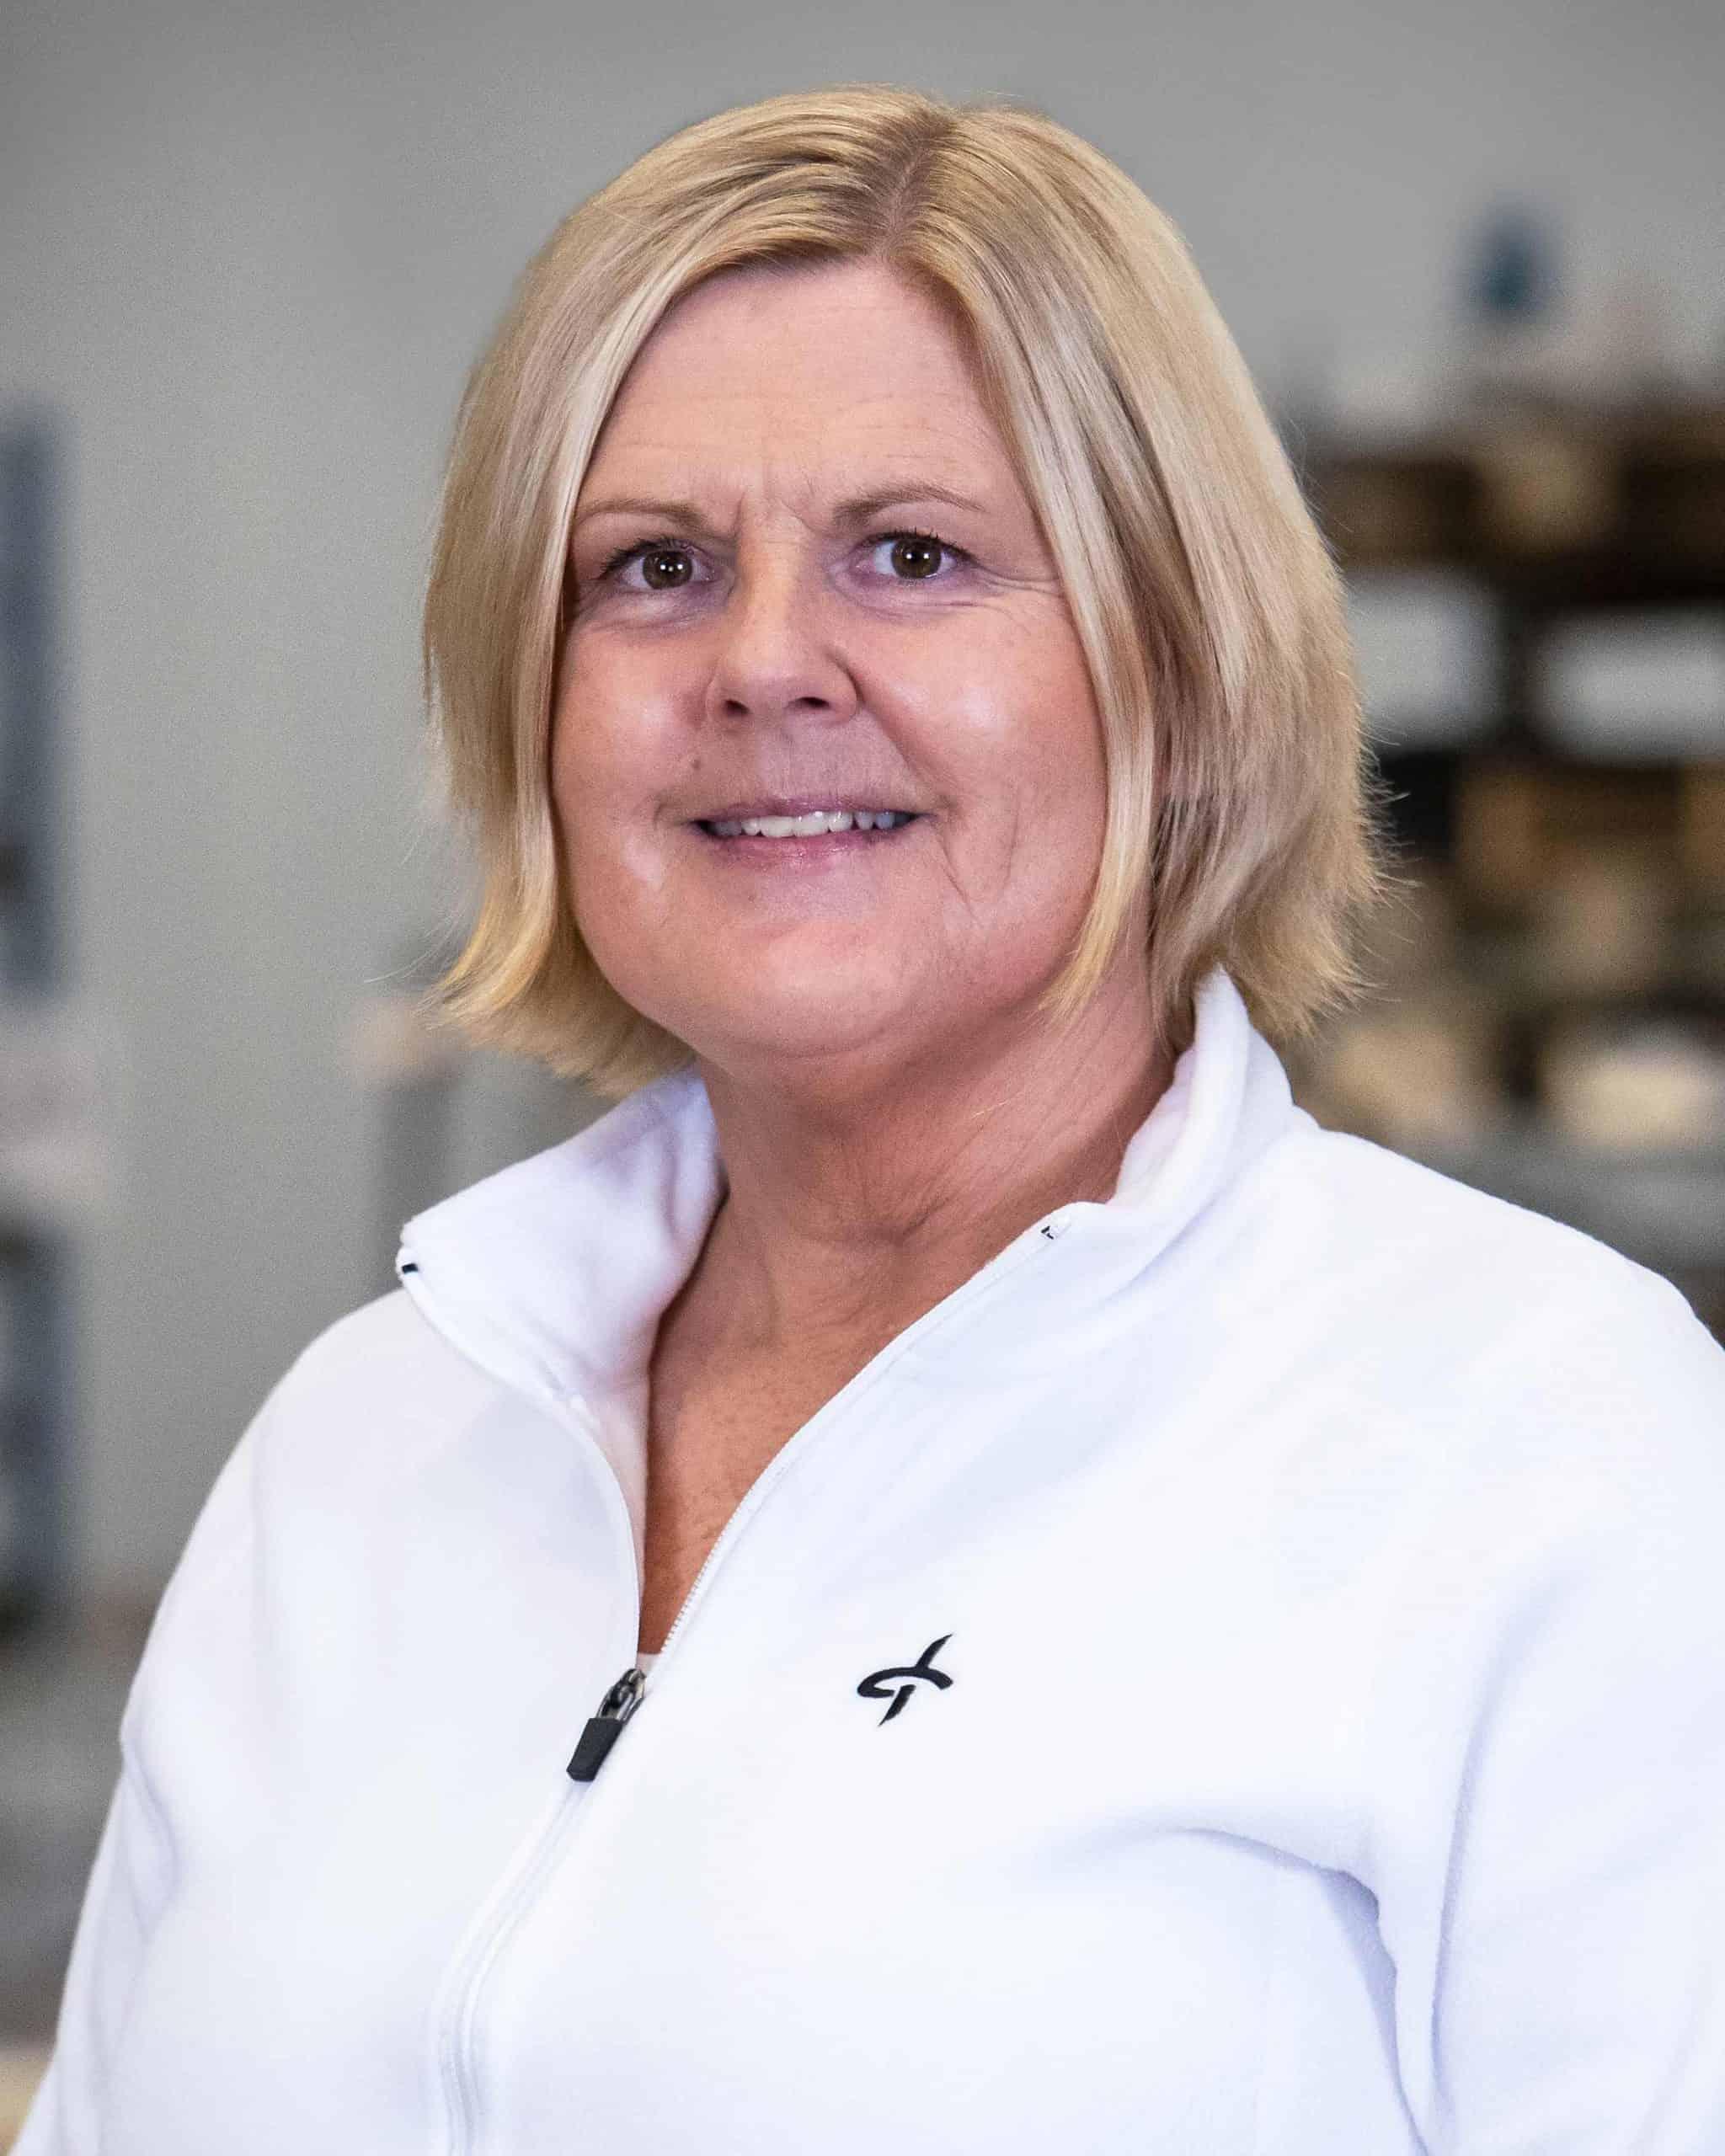 Helen Antonsson